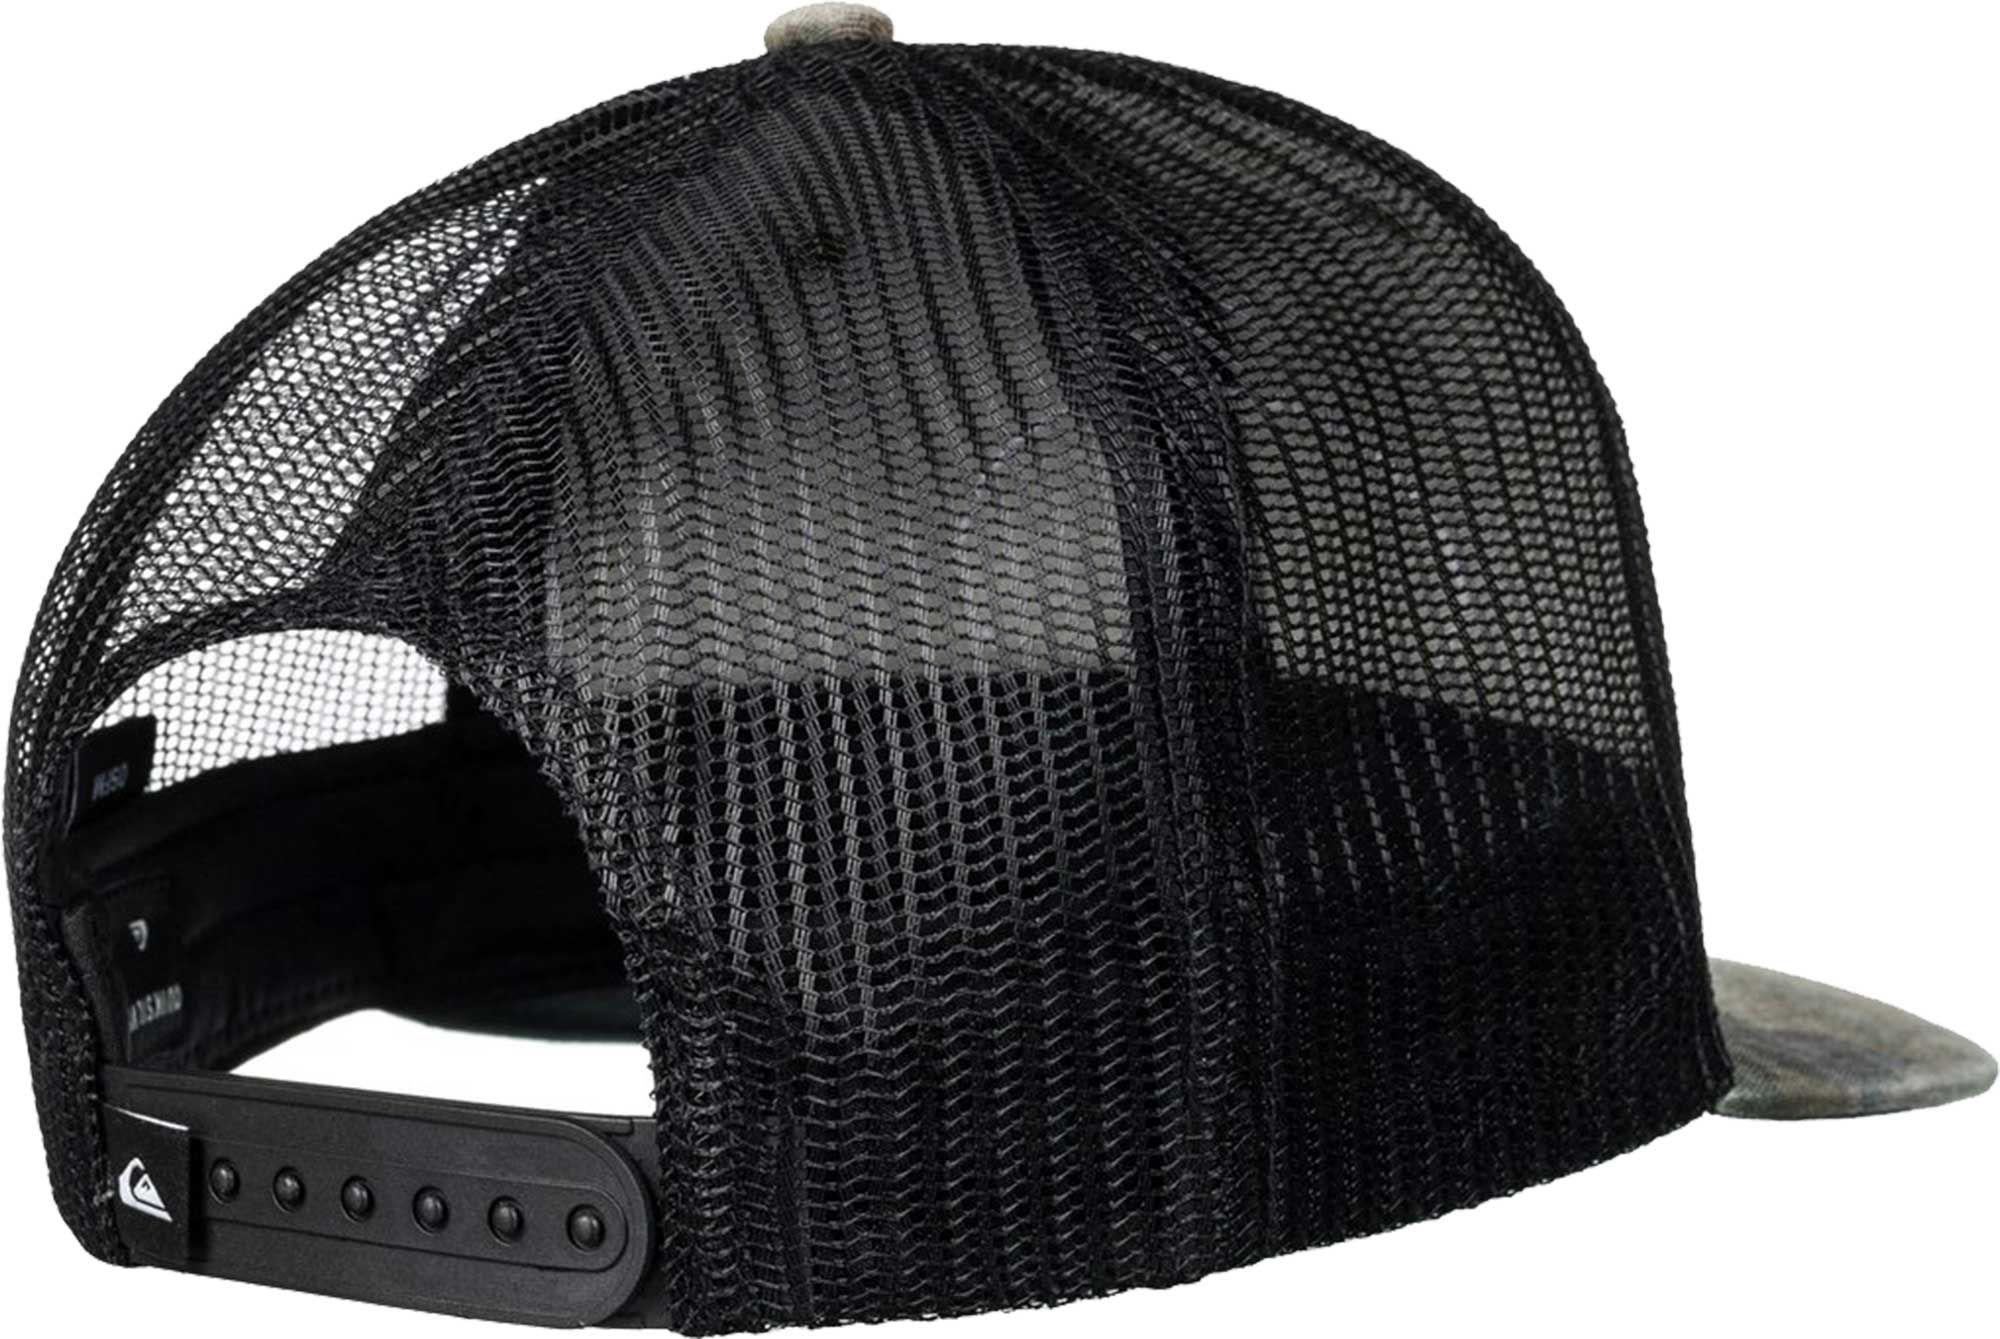 sale retailer 948de c8646 ... italy lyst quiksilver quicksilver silver lining trucker hat in black  for men 75112 bd7d4